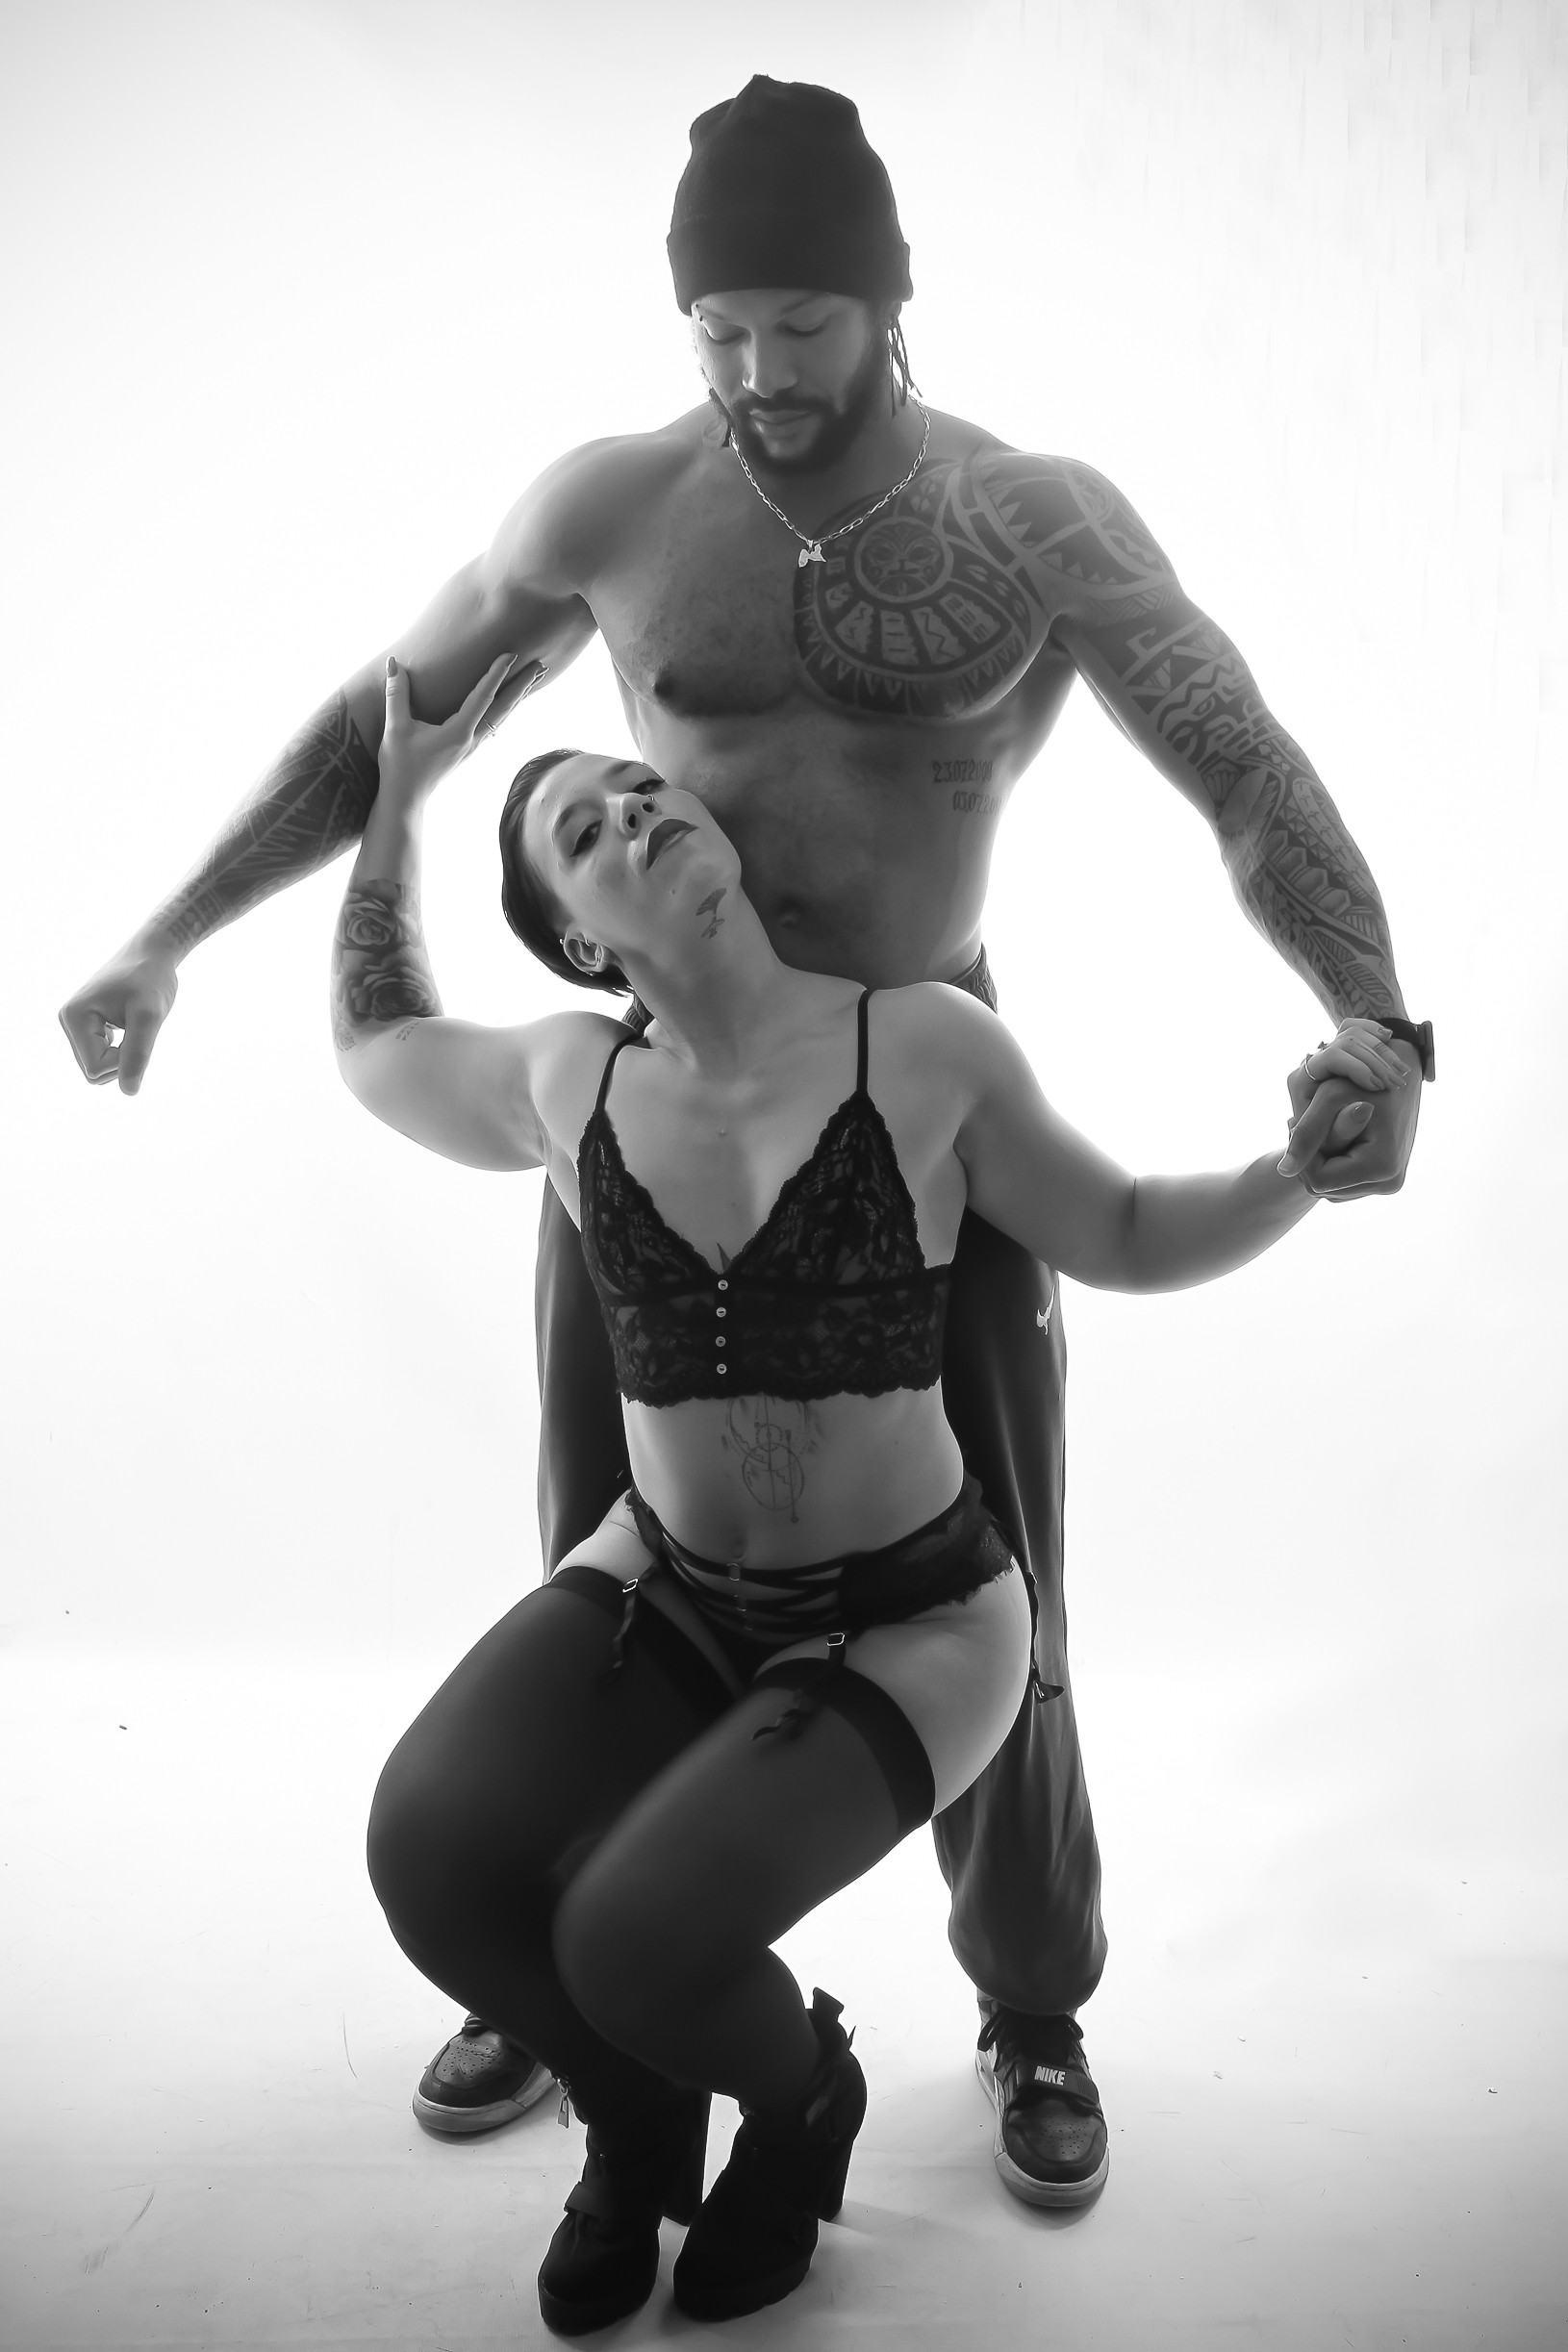 Duo Sexy - tiiamada / andy.971972  by Vortex60 Photographe